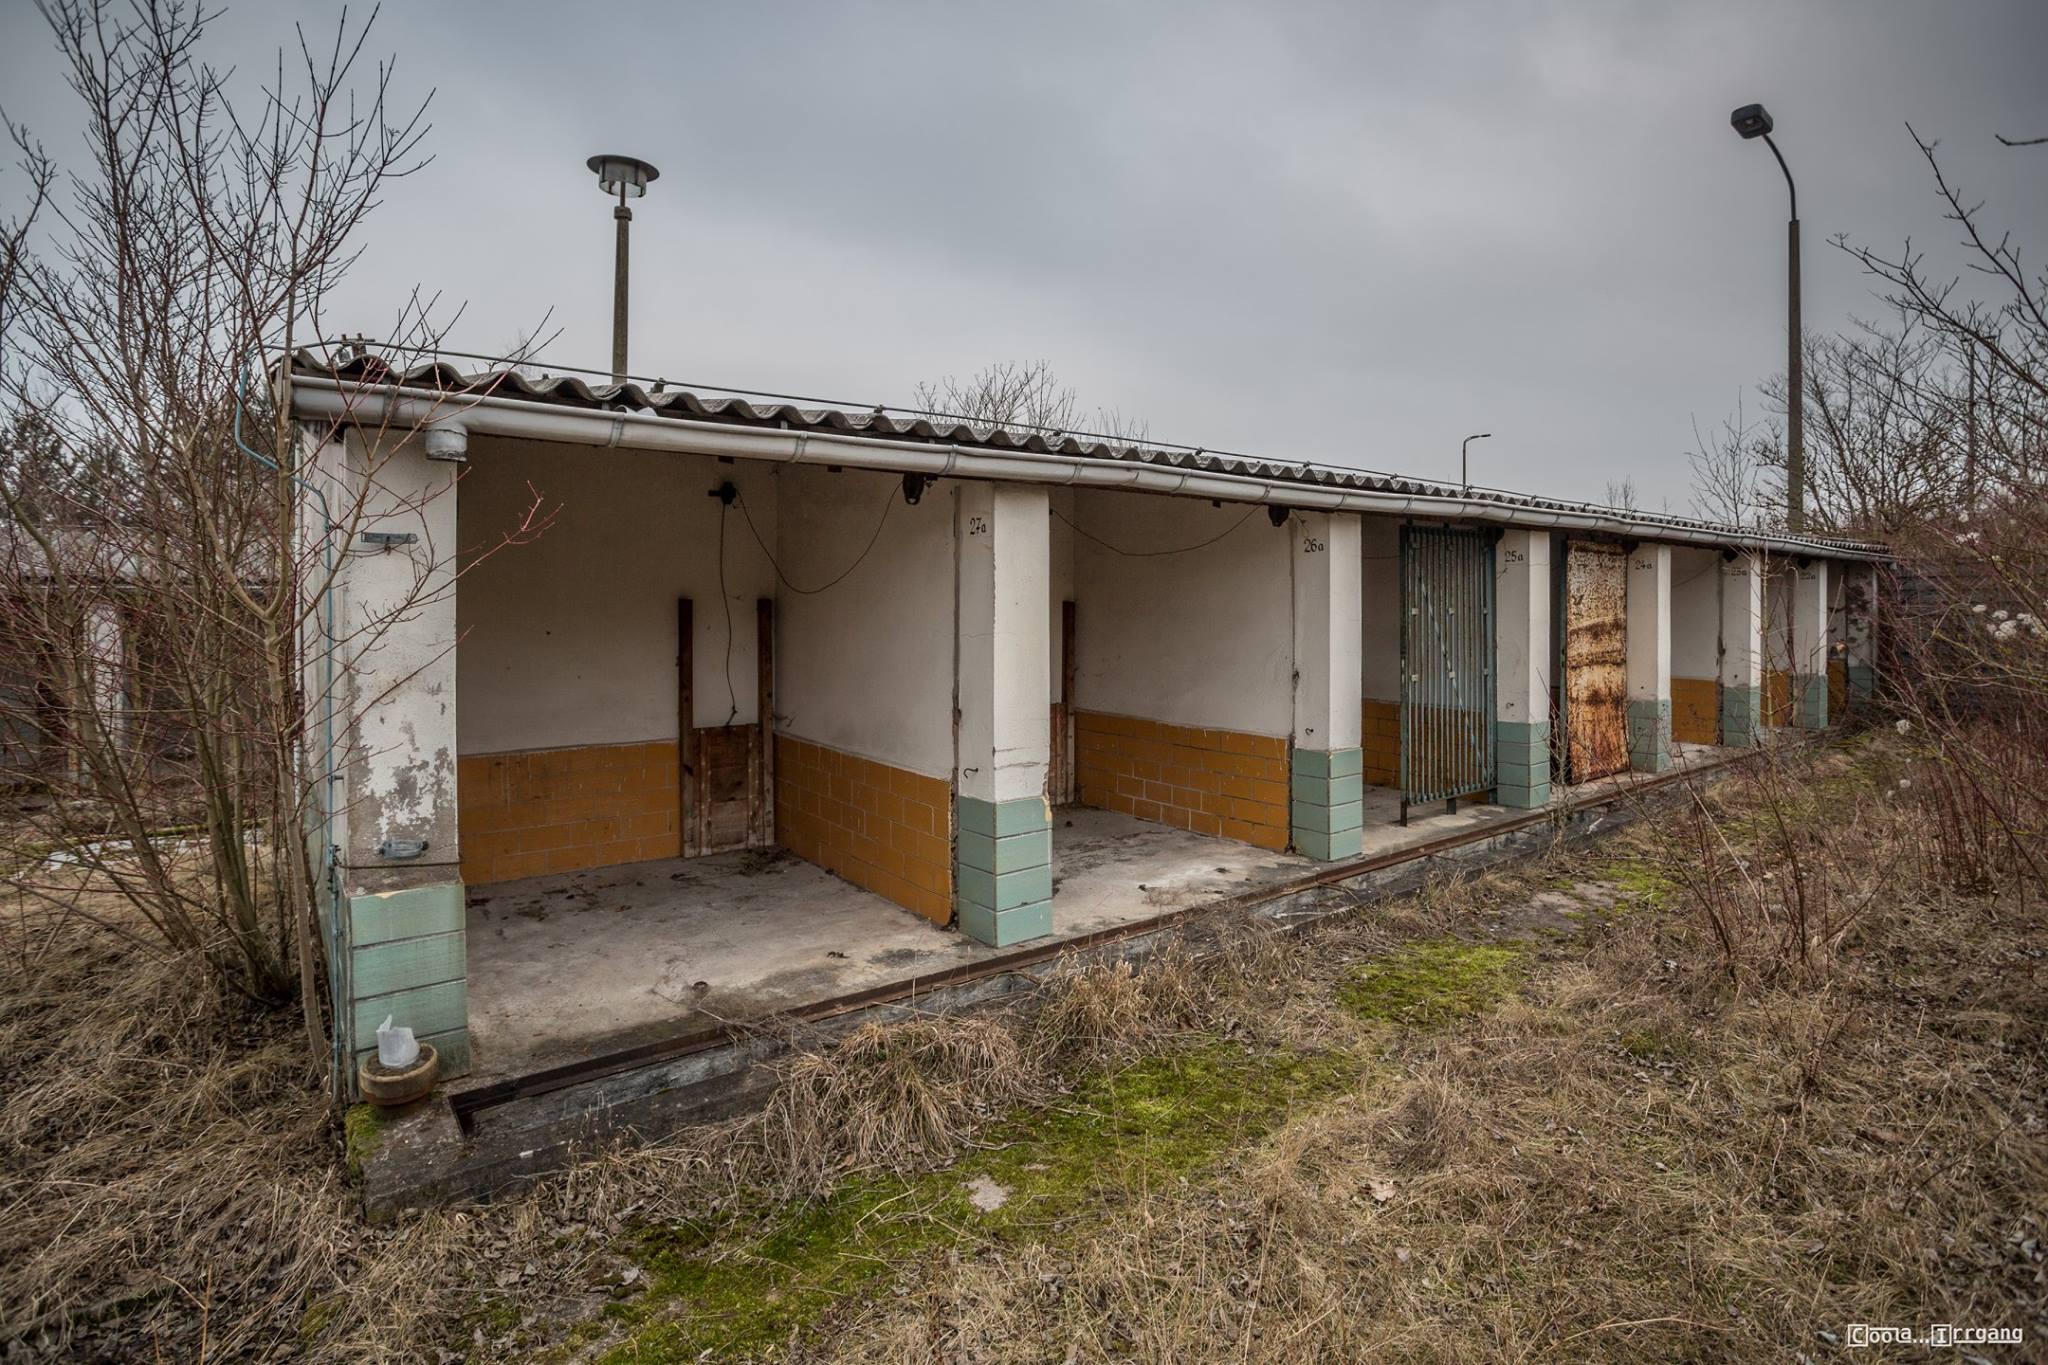 Grenzübergang Wartha Herleshausen